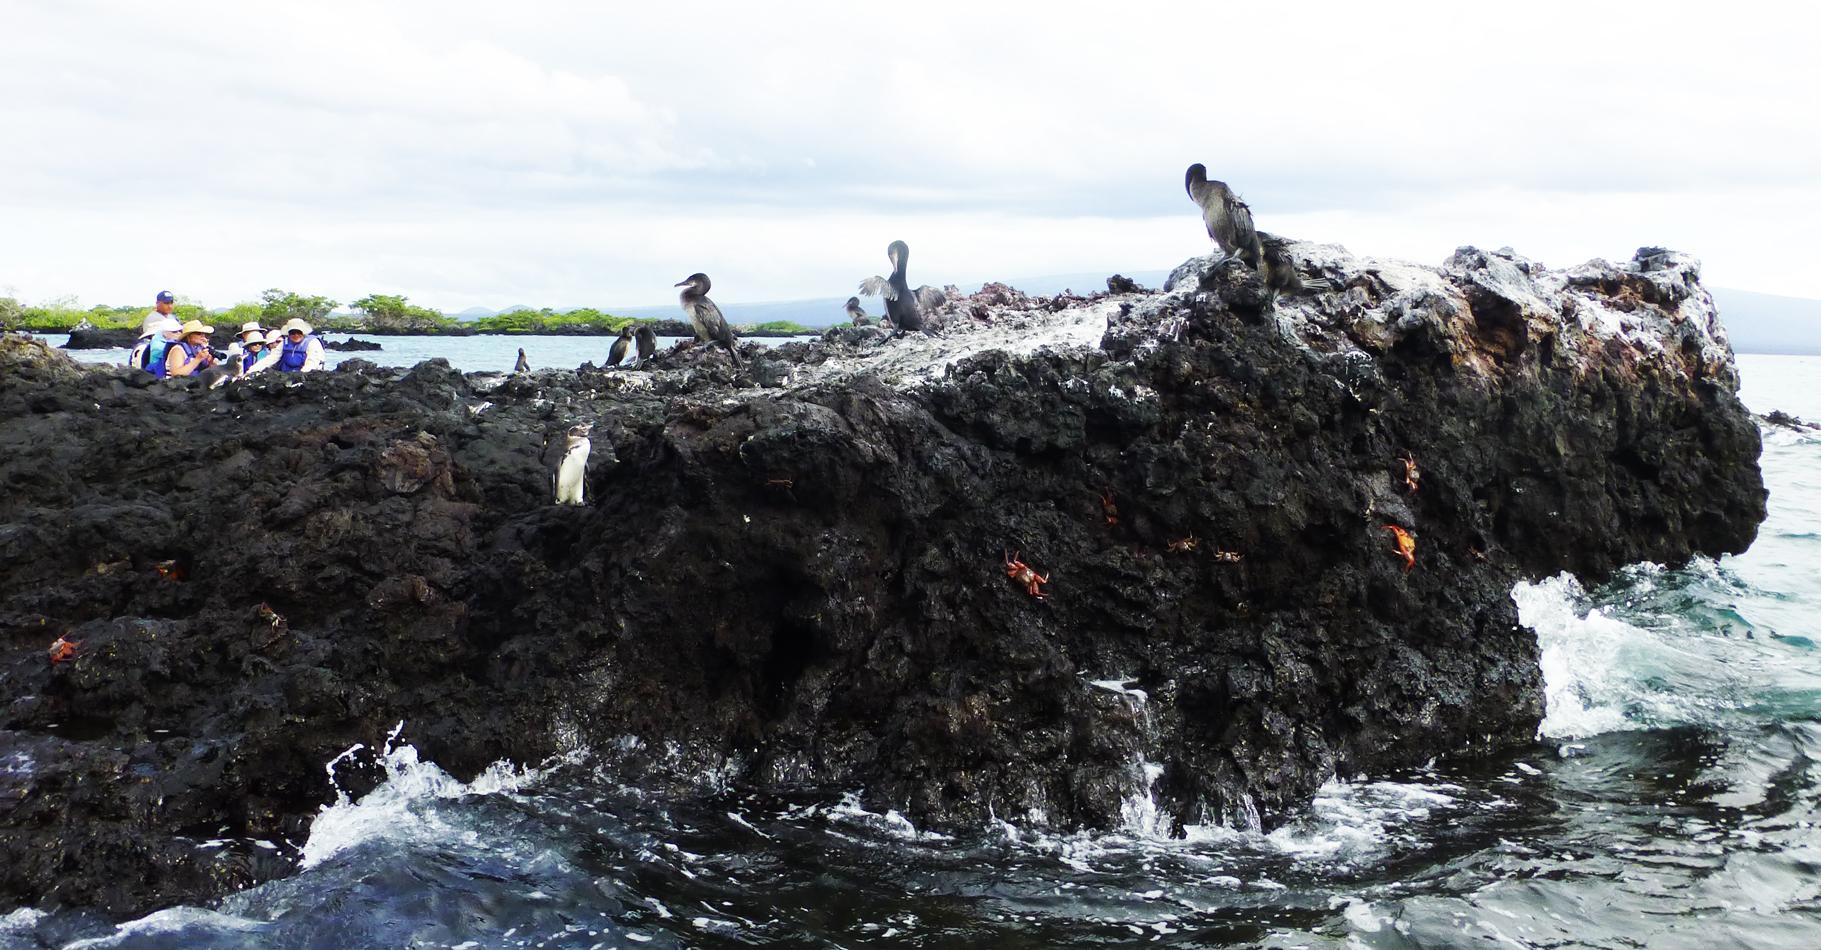 Penguins and Flightless Cormorants